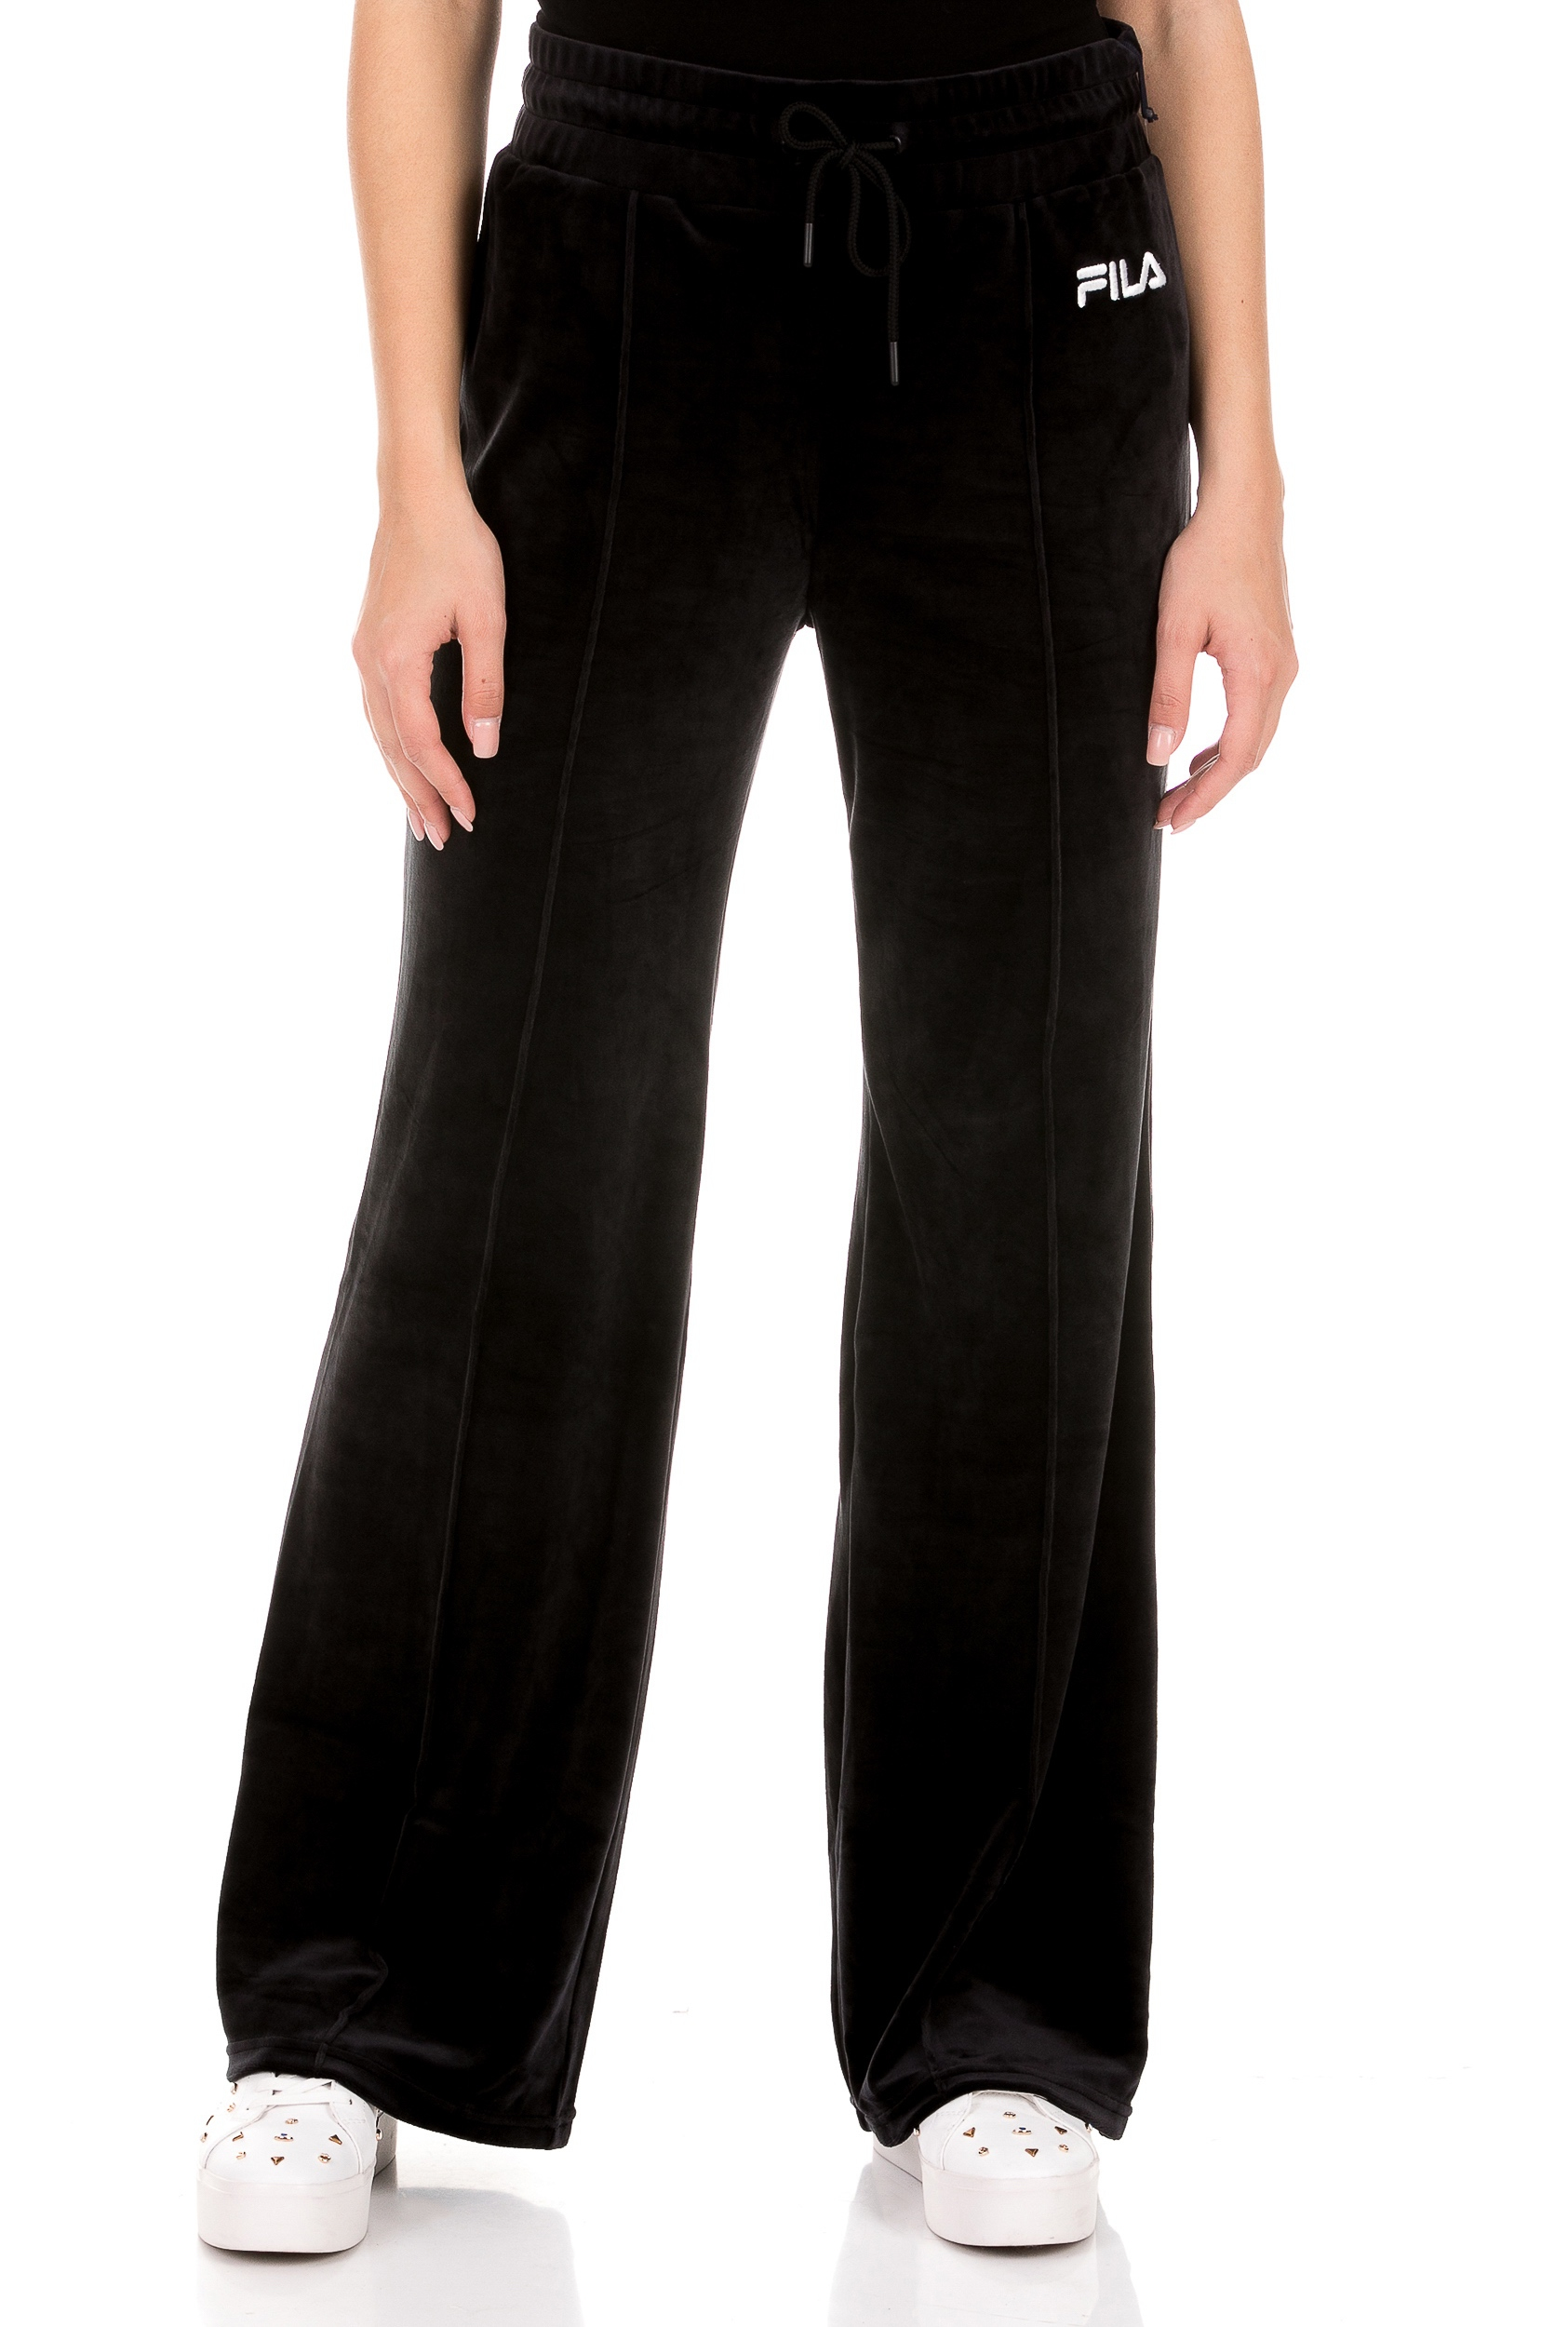 FILA - Γυναικείο παντελόνι φόρμας FILA ASTRID μαύρο